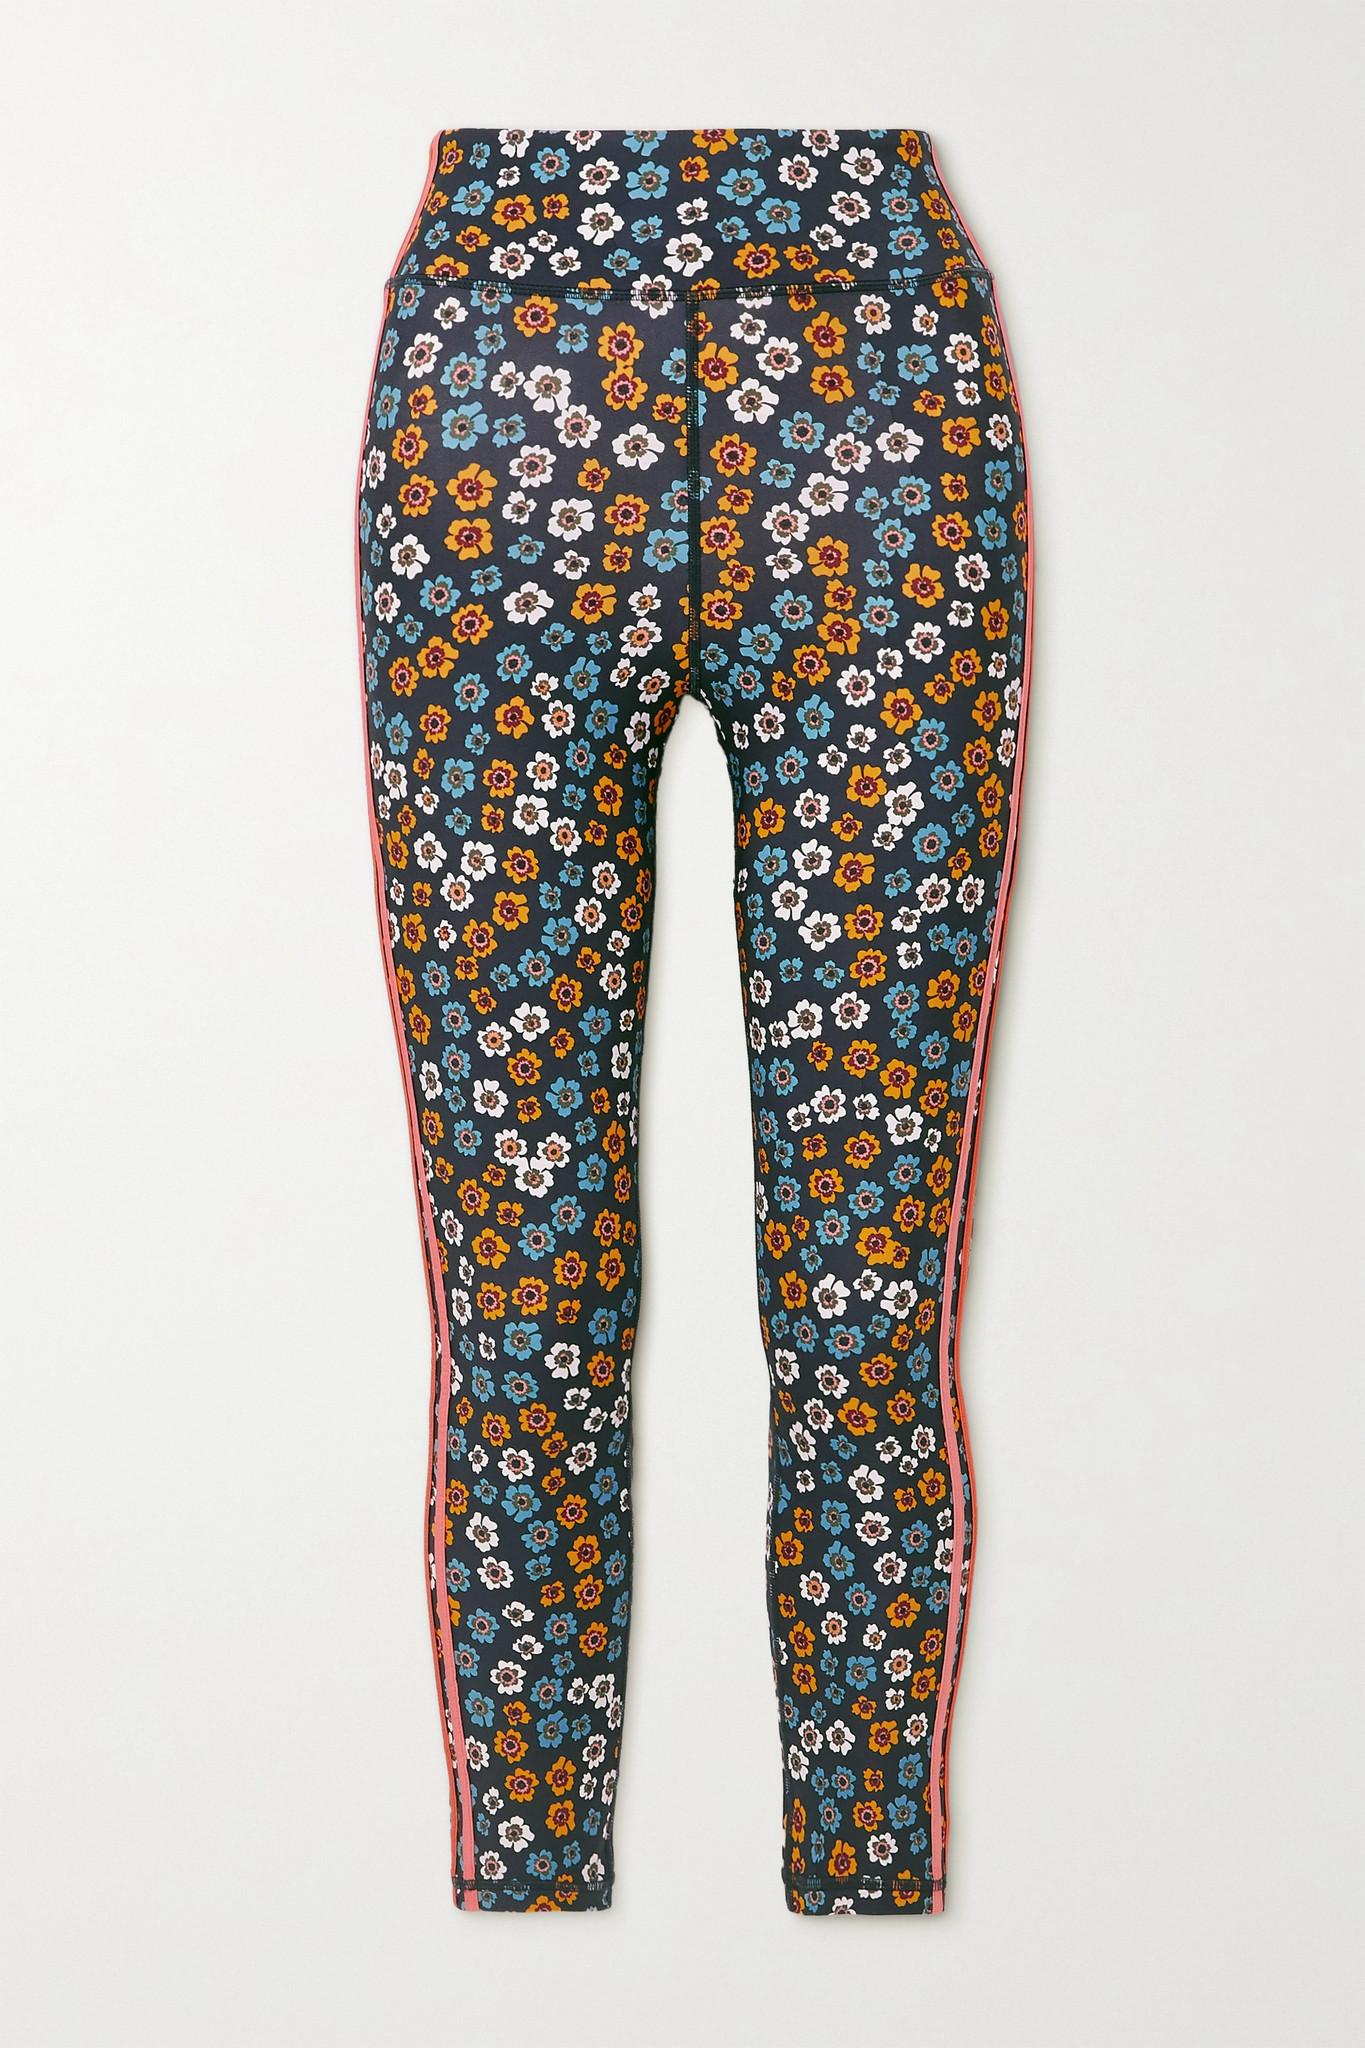 THE UPSIDE - Atacama Dance Striped Floral-print Stretch Leggings - Blue - medium